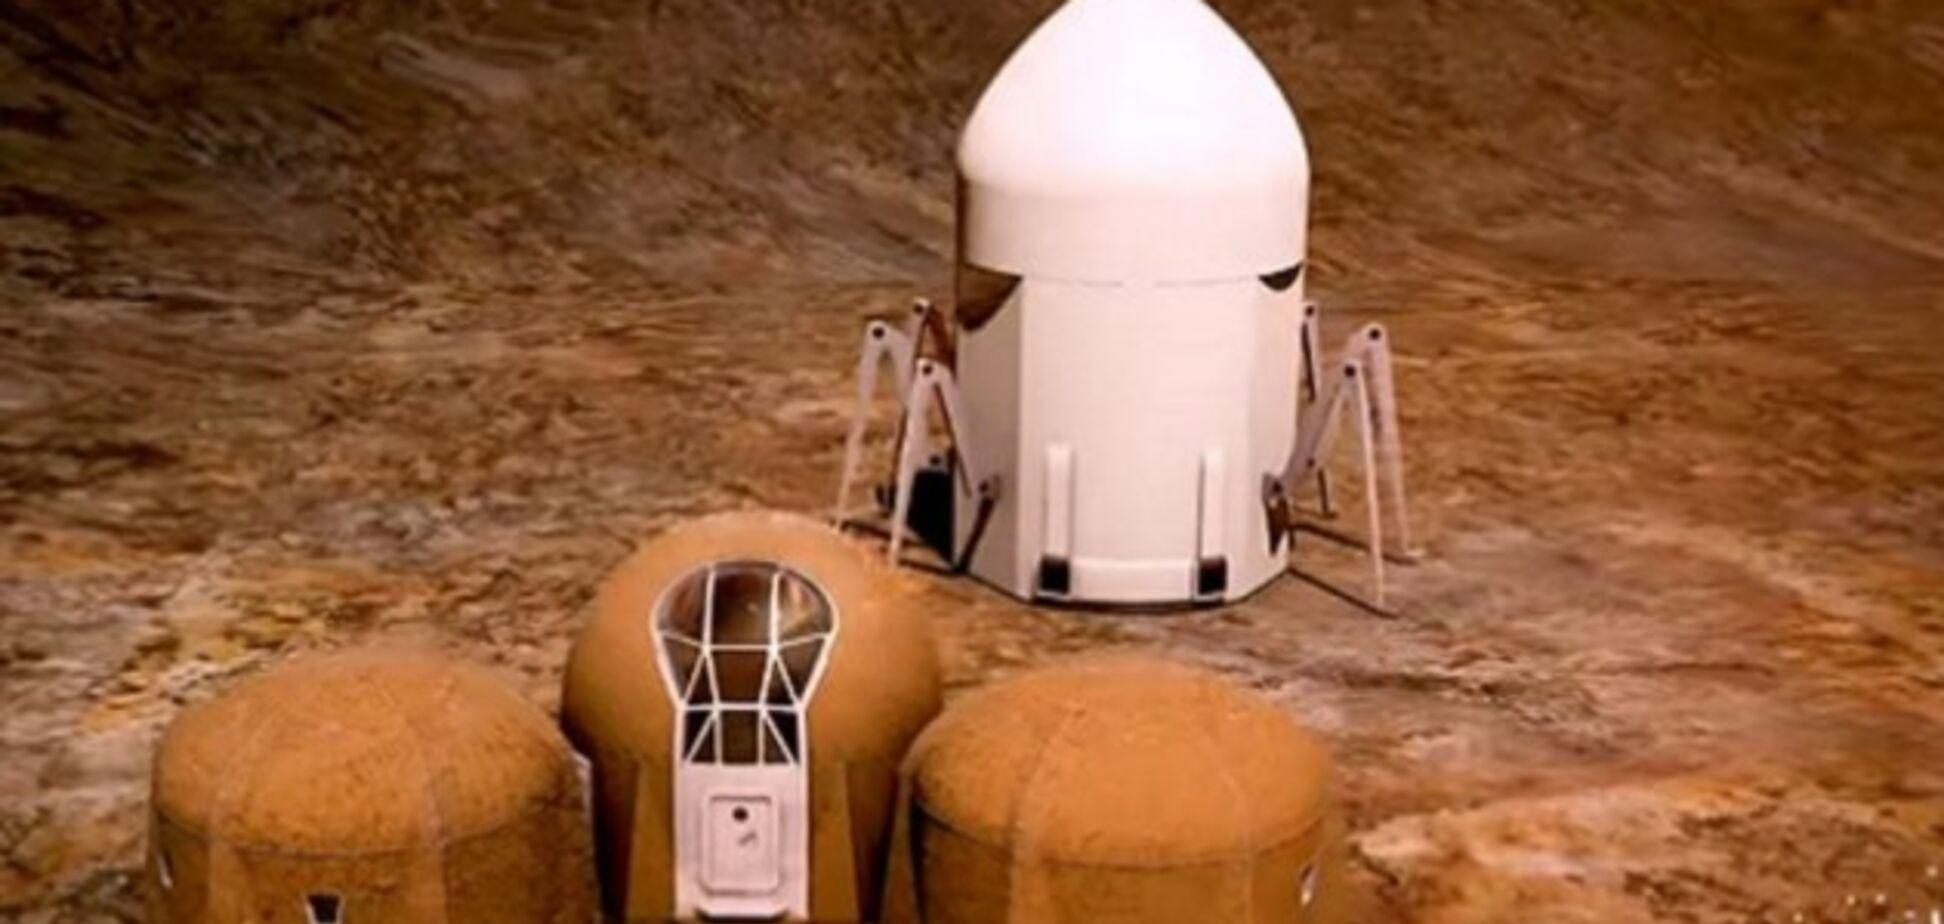 NASA показало, каким будет первое жилье на Марсе